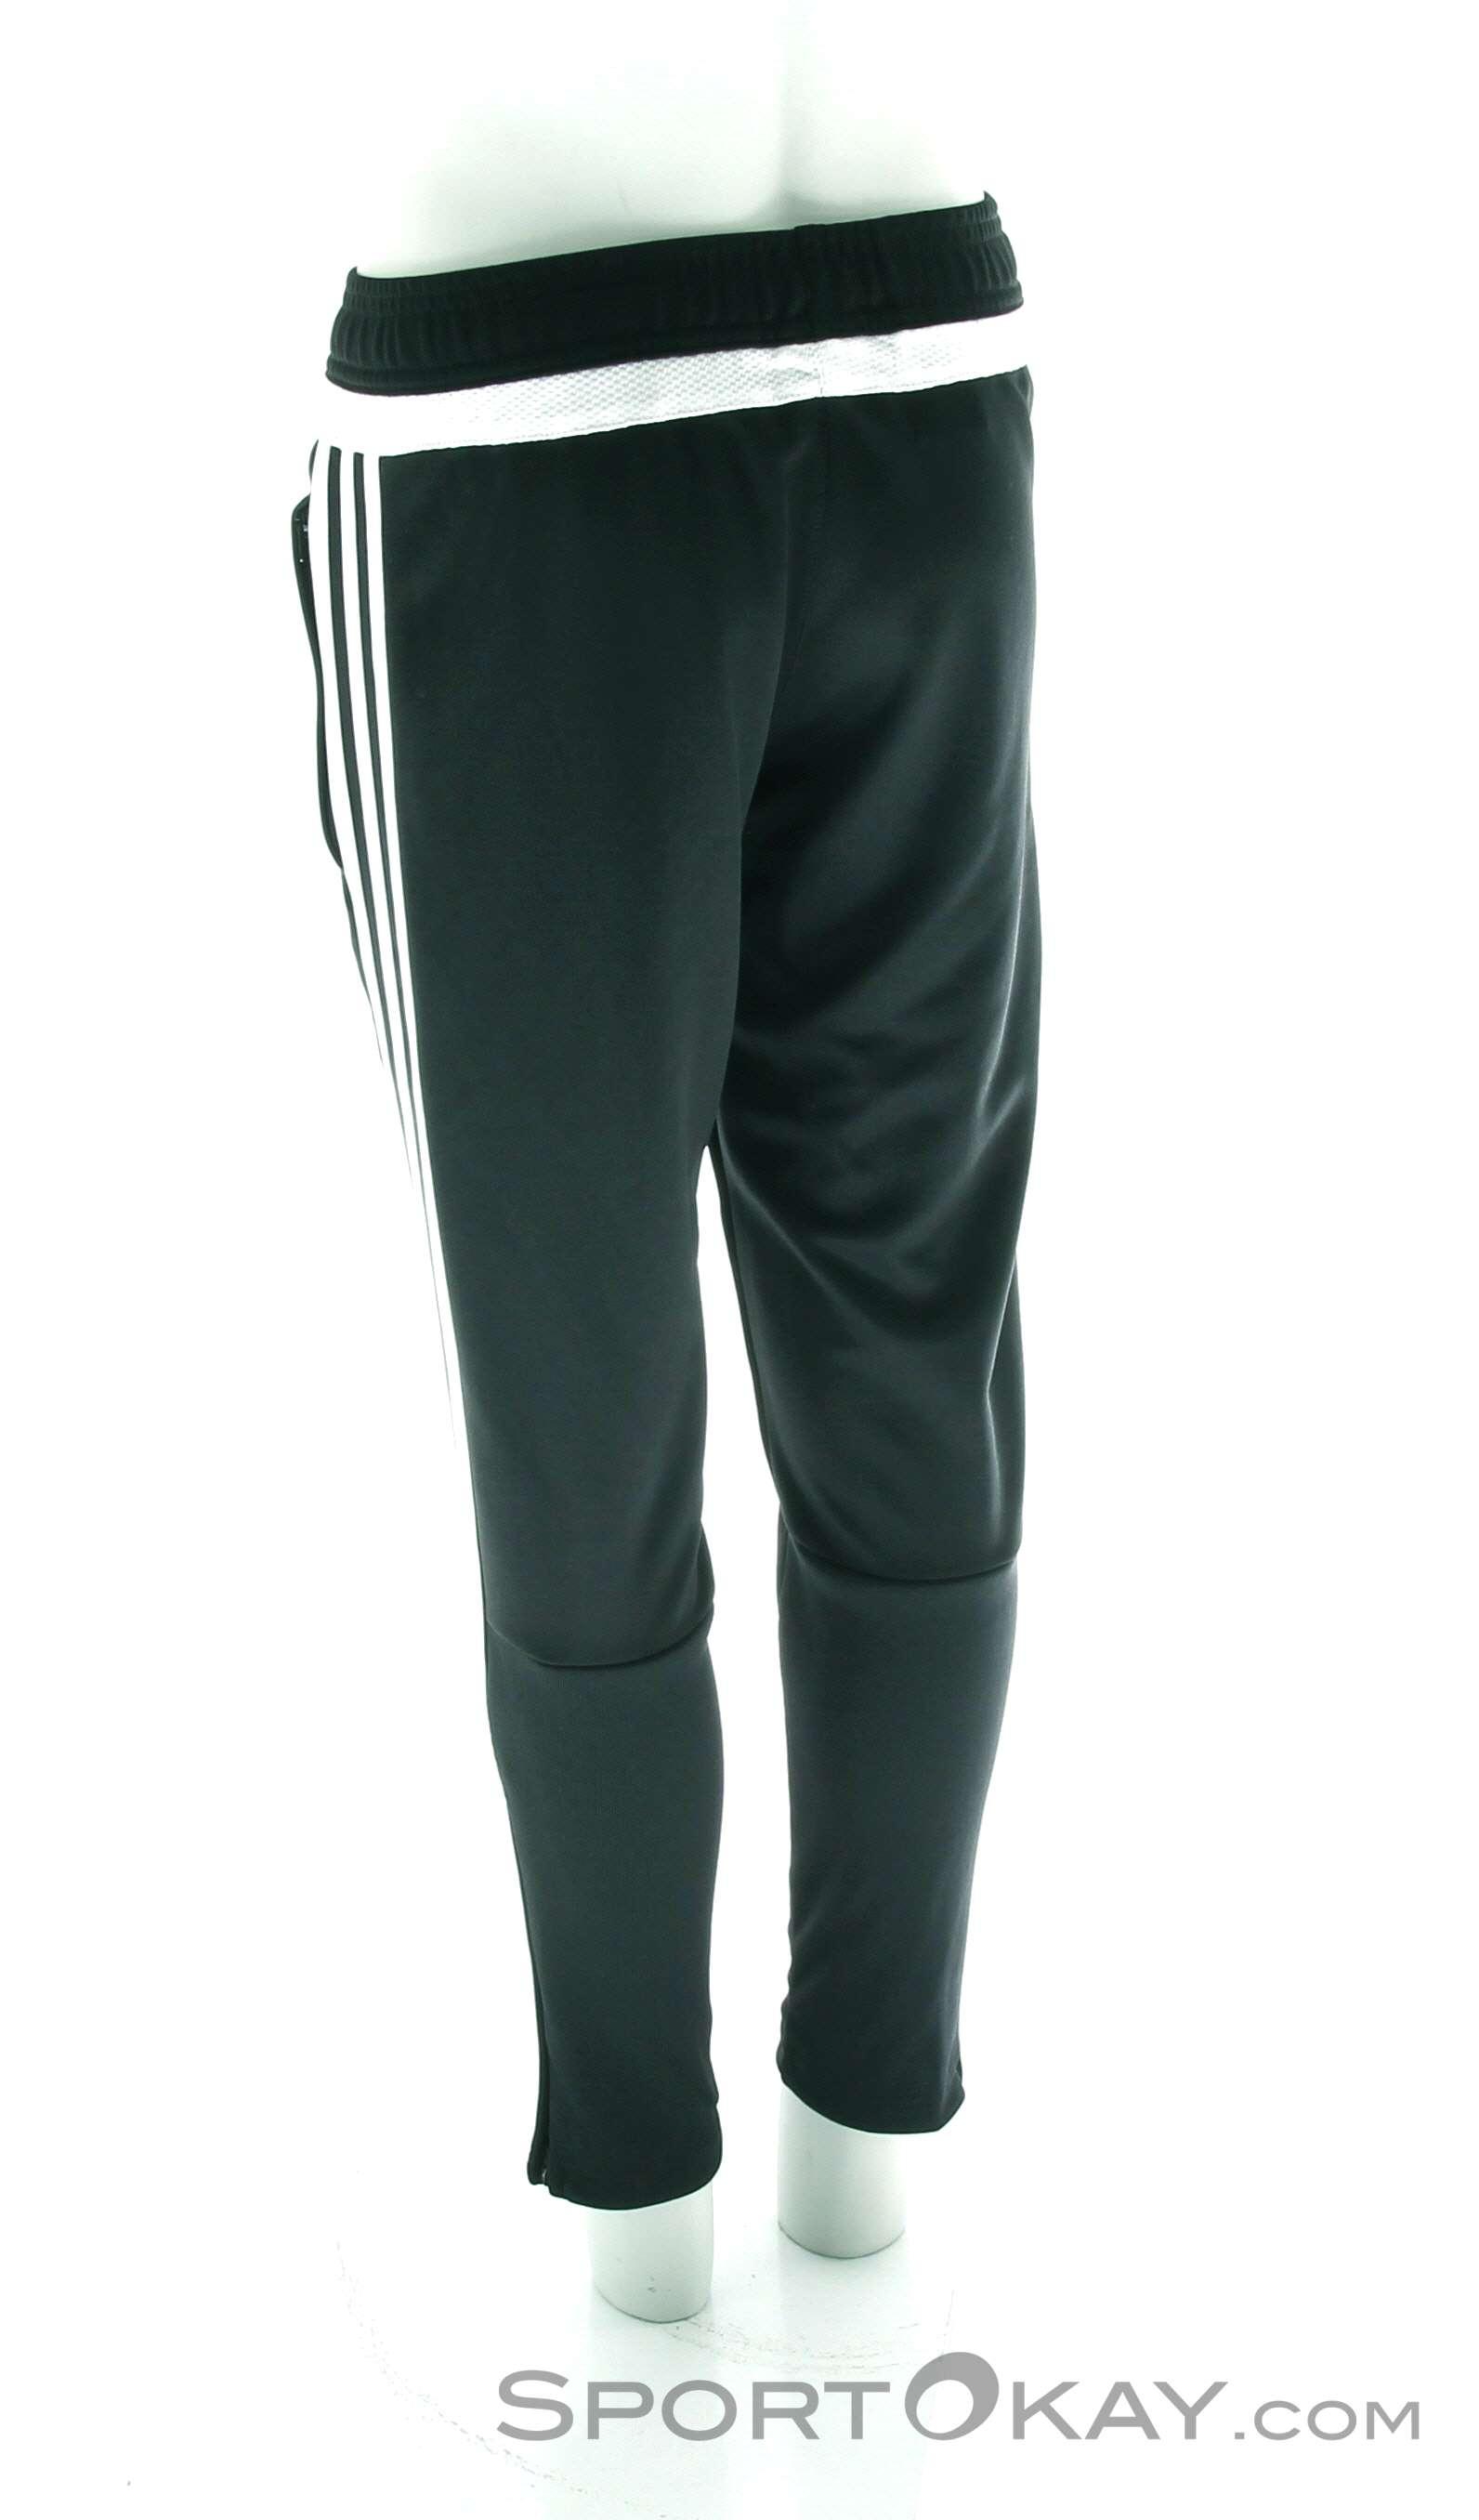 Adidas Tiro 15 Training Pant Boys Training Pants, adidas, Black, , Boy,